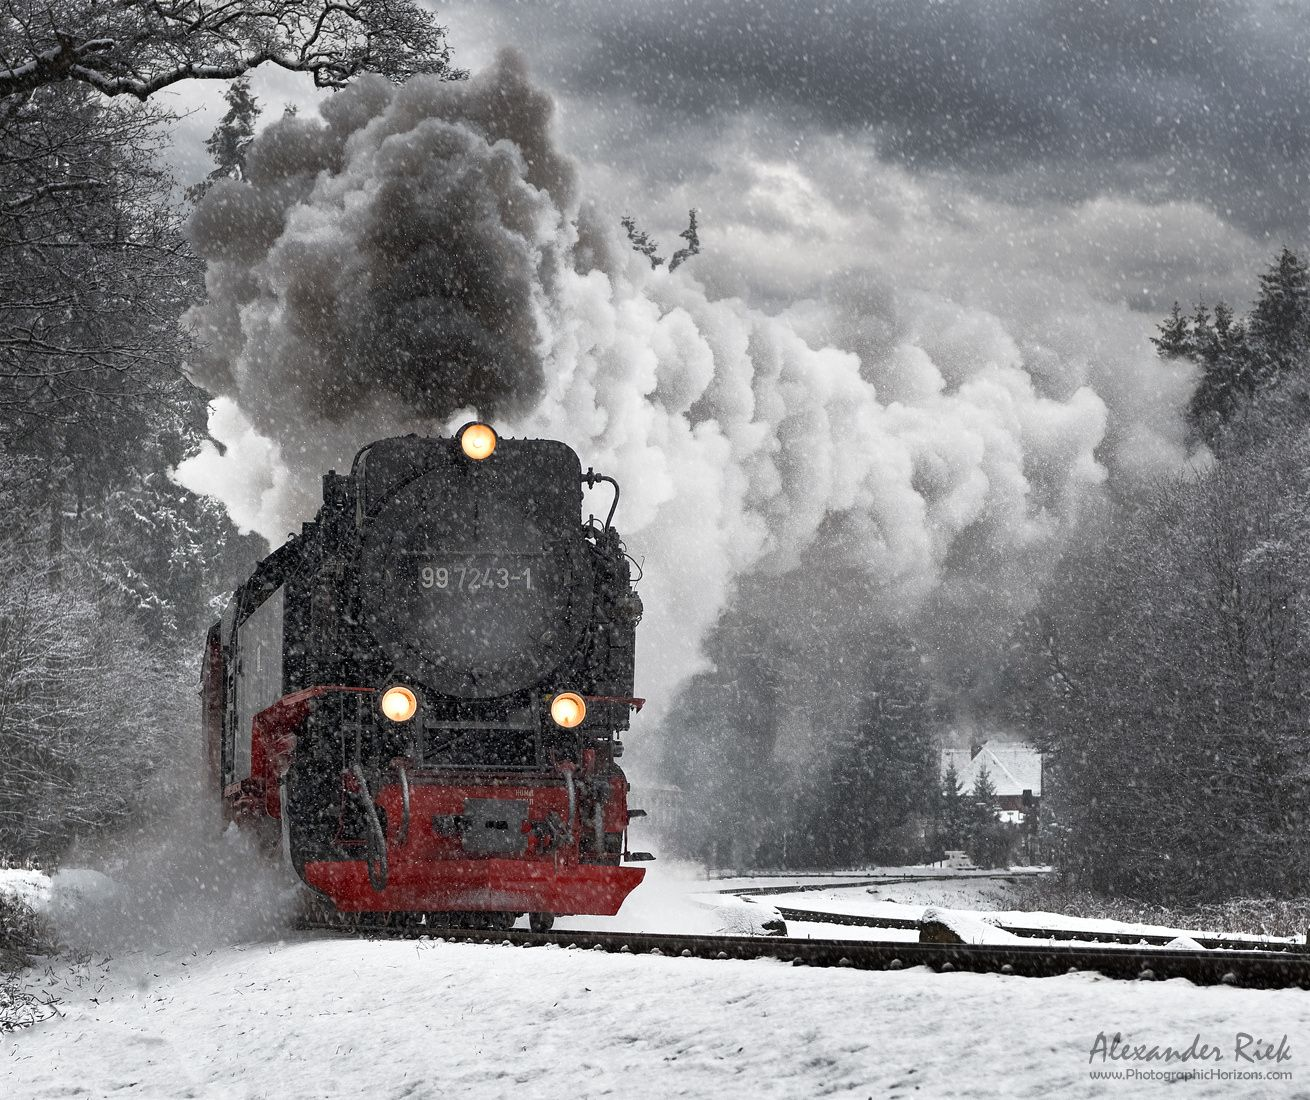 Photograph Snow Machine By Alexander Riek On 500px